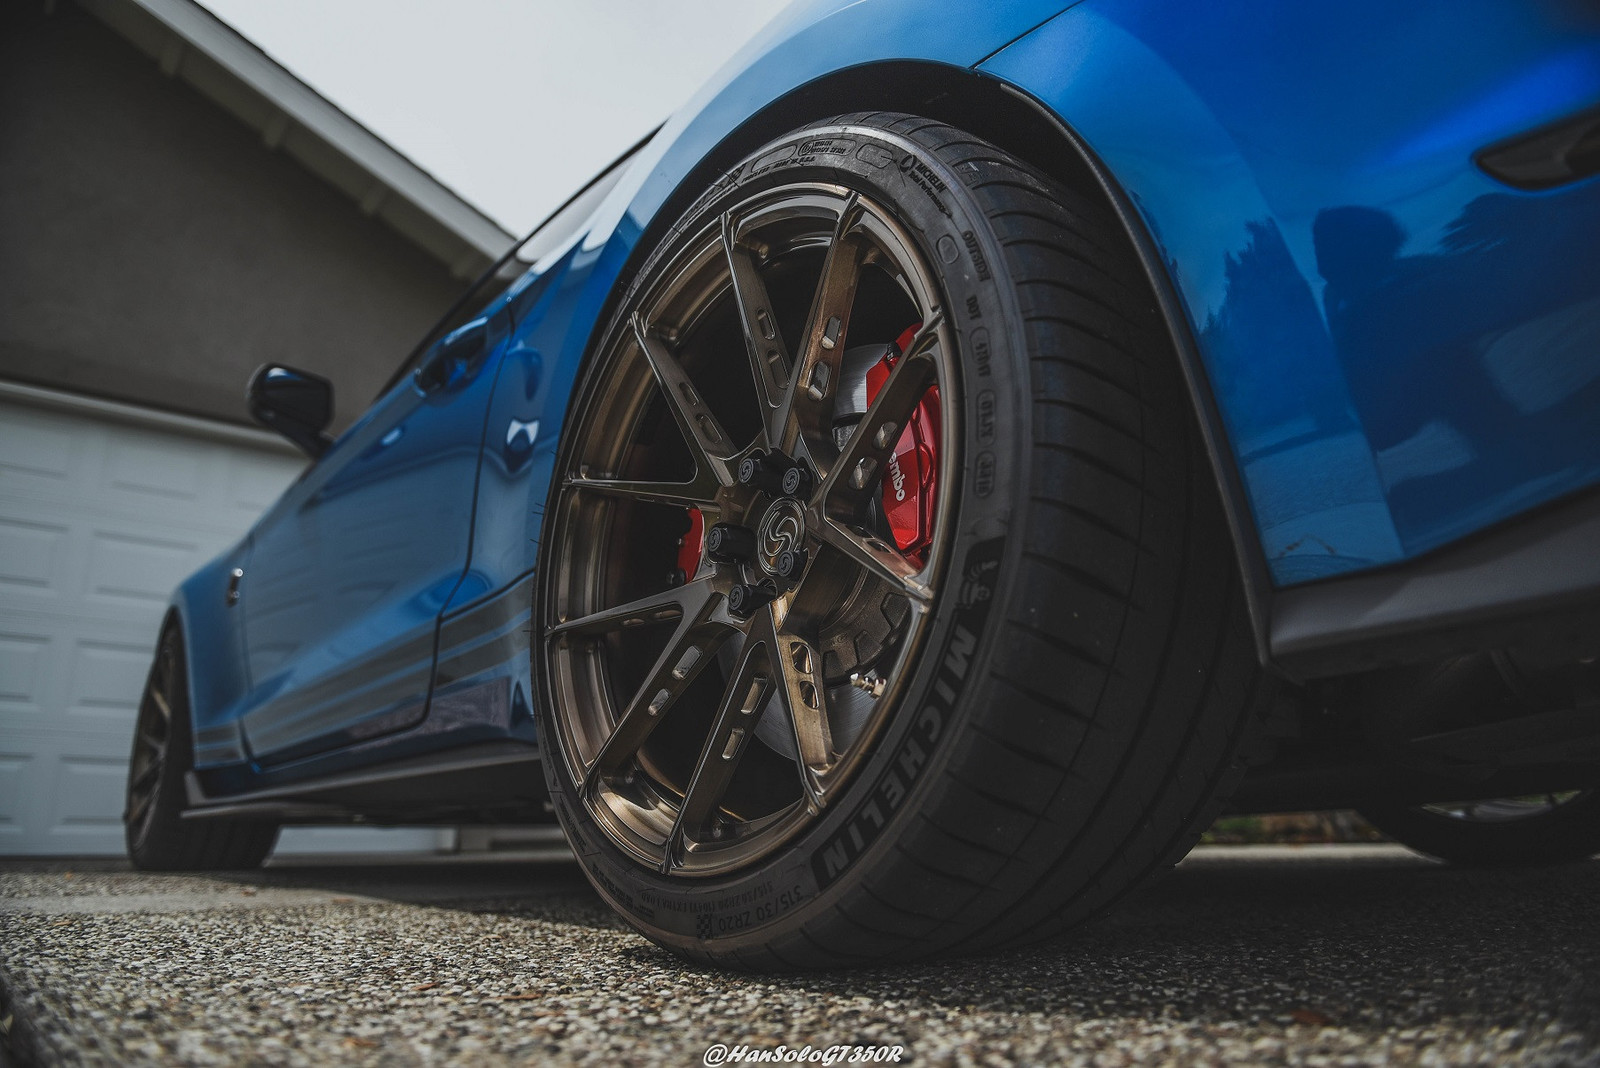 SV801-GT500-Brushed-Bronze-Tinted-Caliper-Wrap-4-of-8.jpg